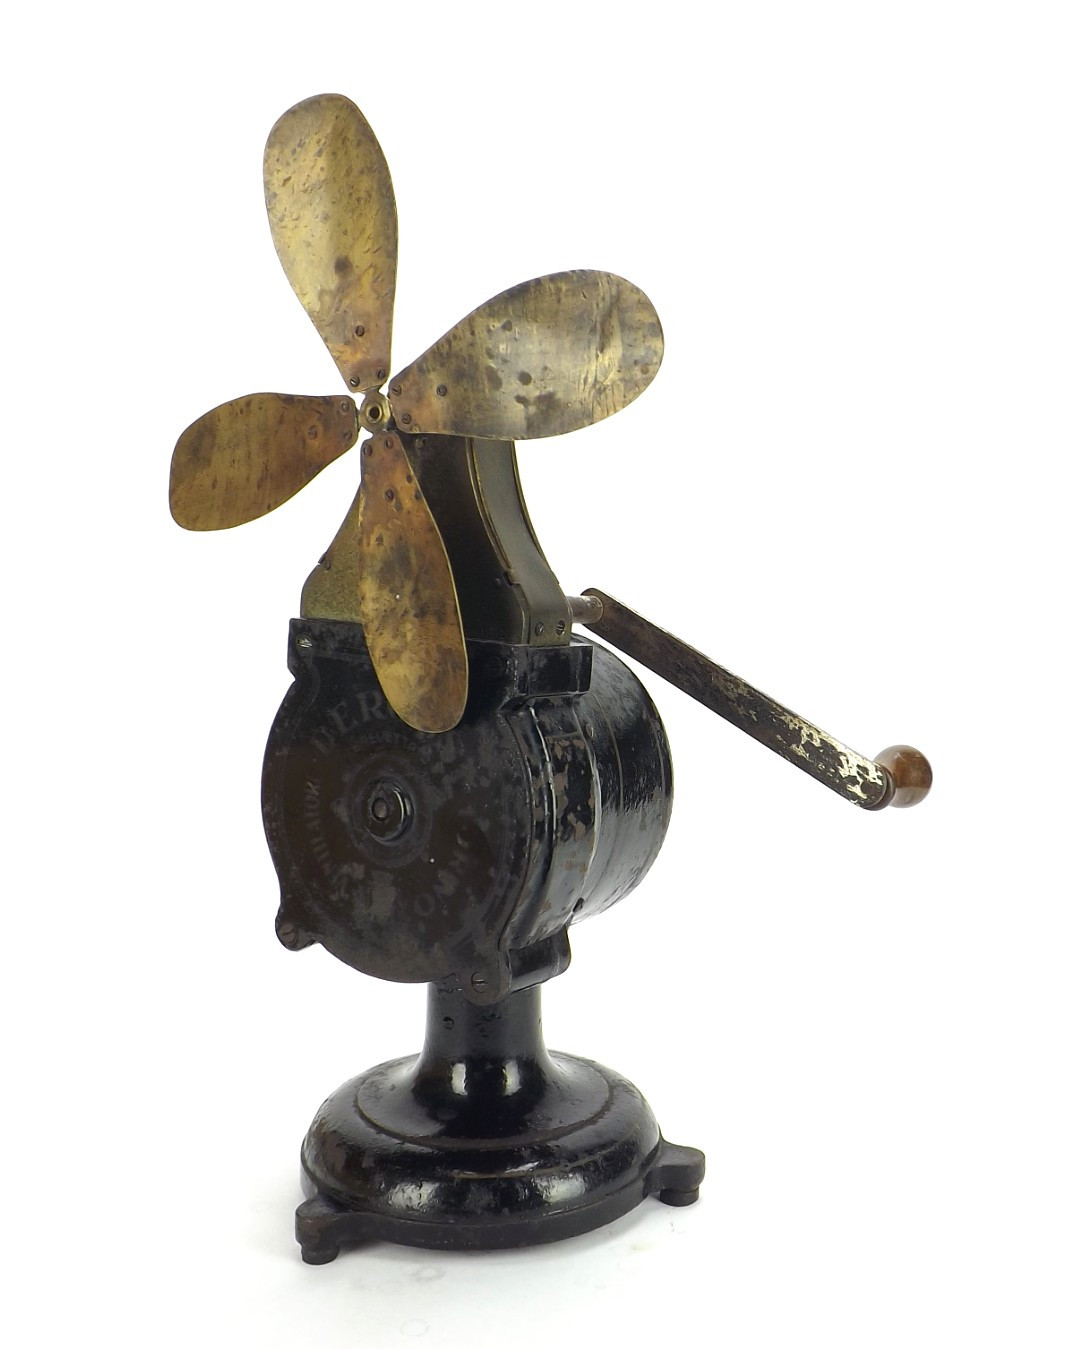 Circa Late 1800's DeRossi Clockwork Fan Ventilator